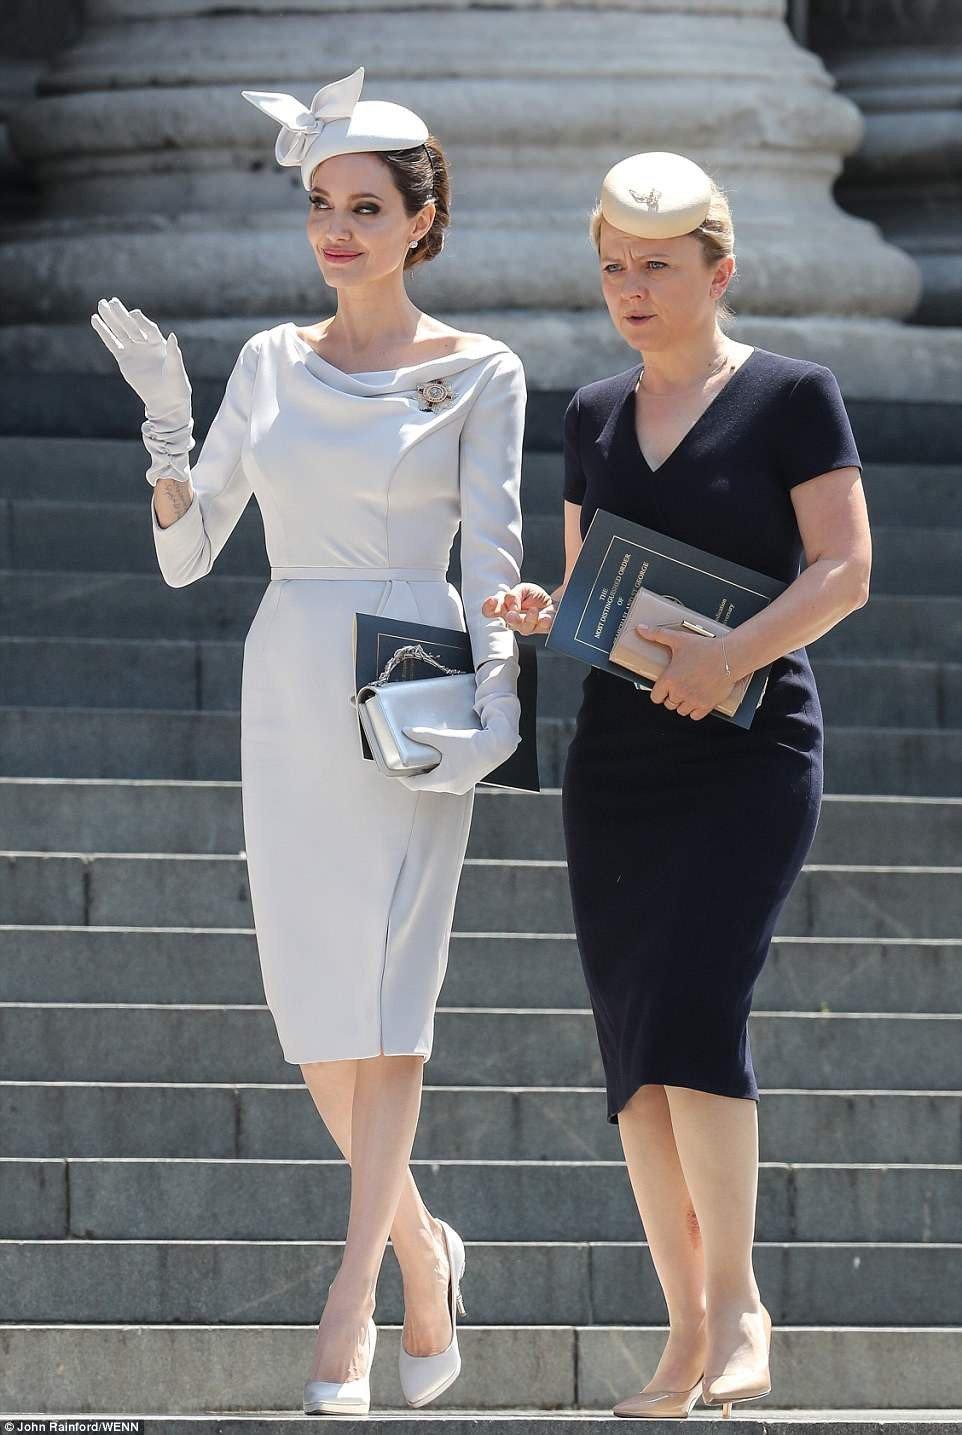 Angelina Jolie xuat hien quy phai nhung van gay guoc hinh anh 1